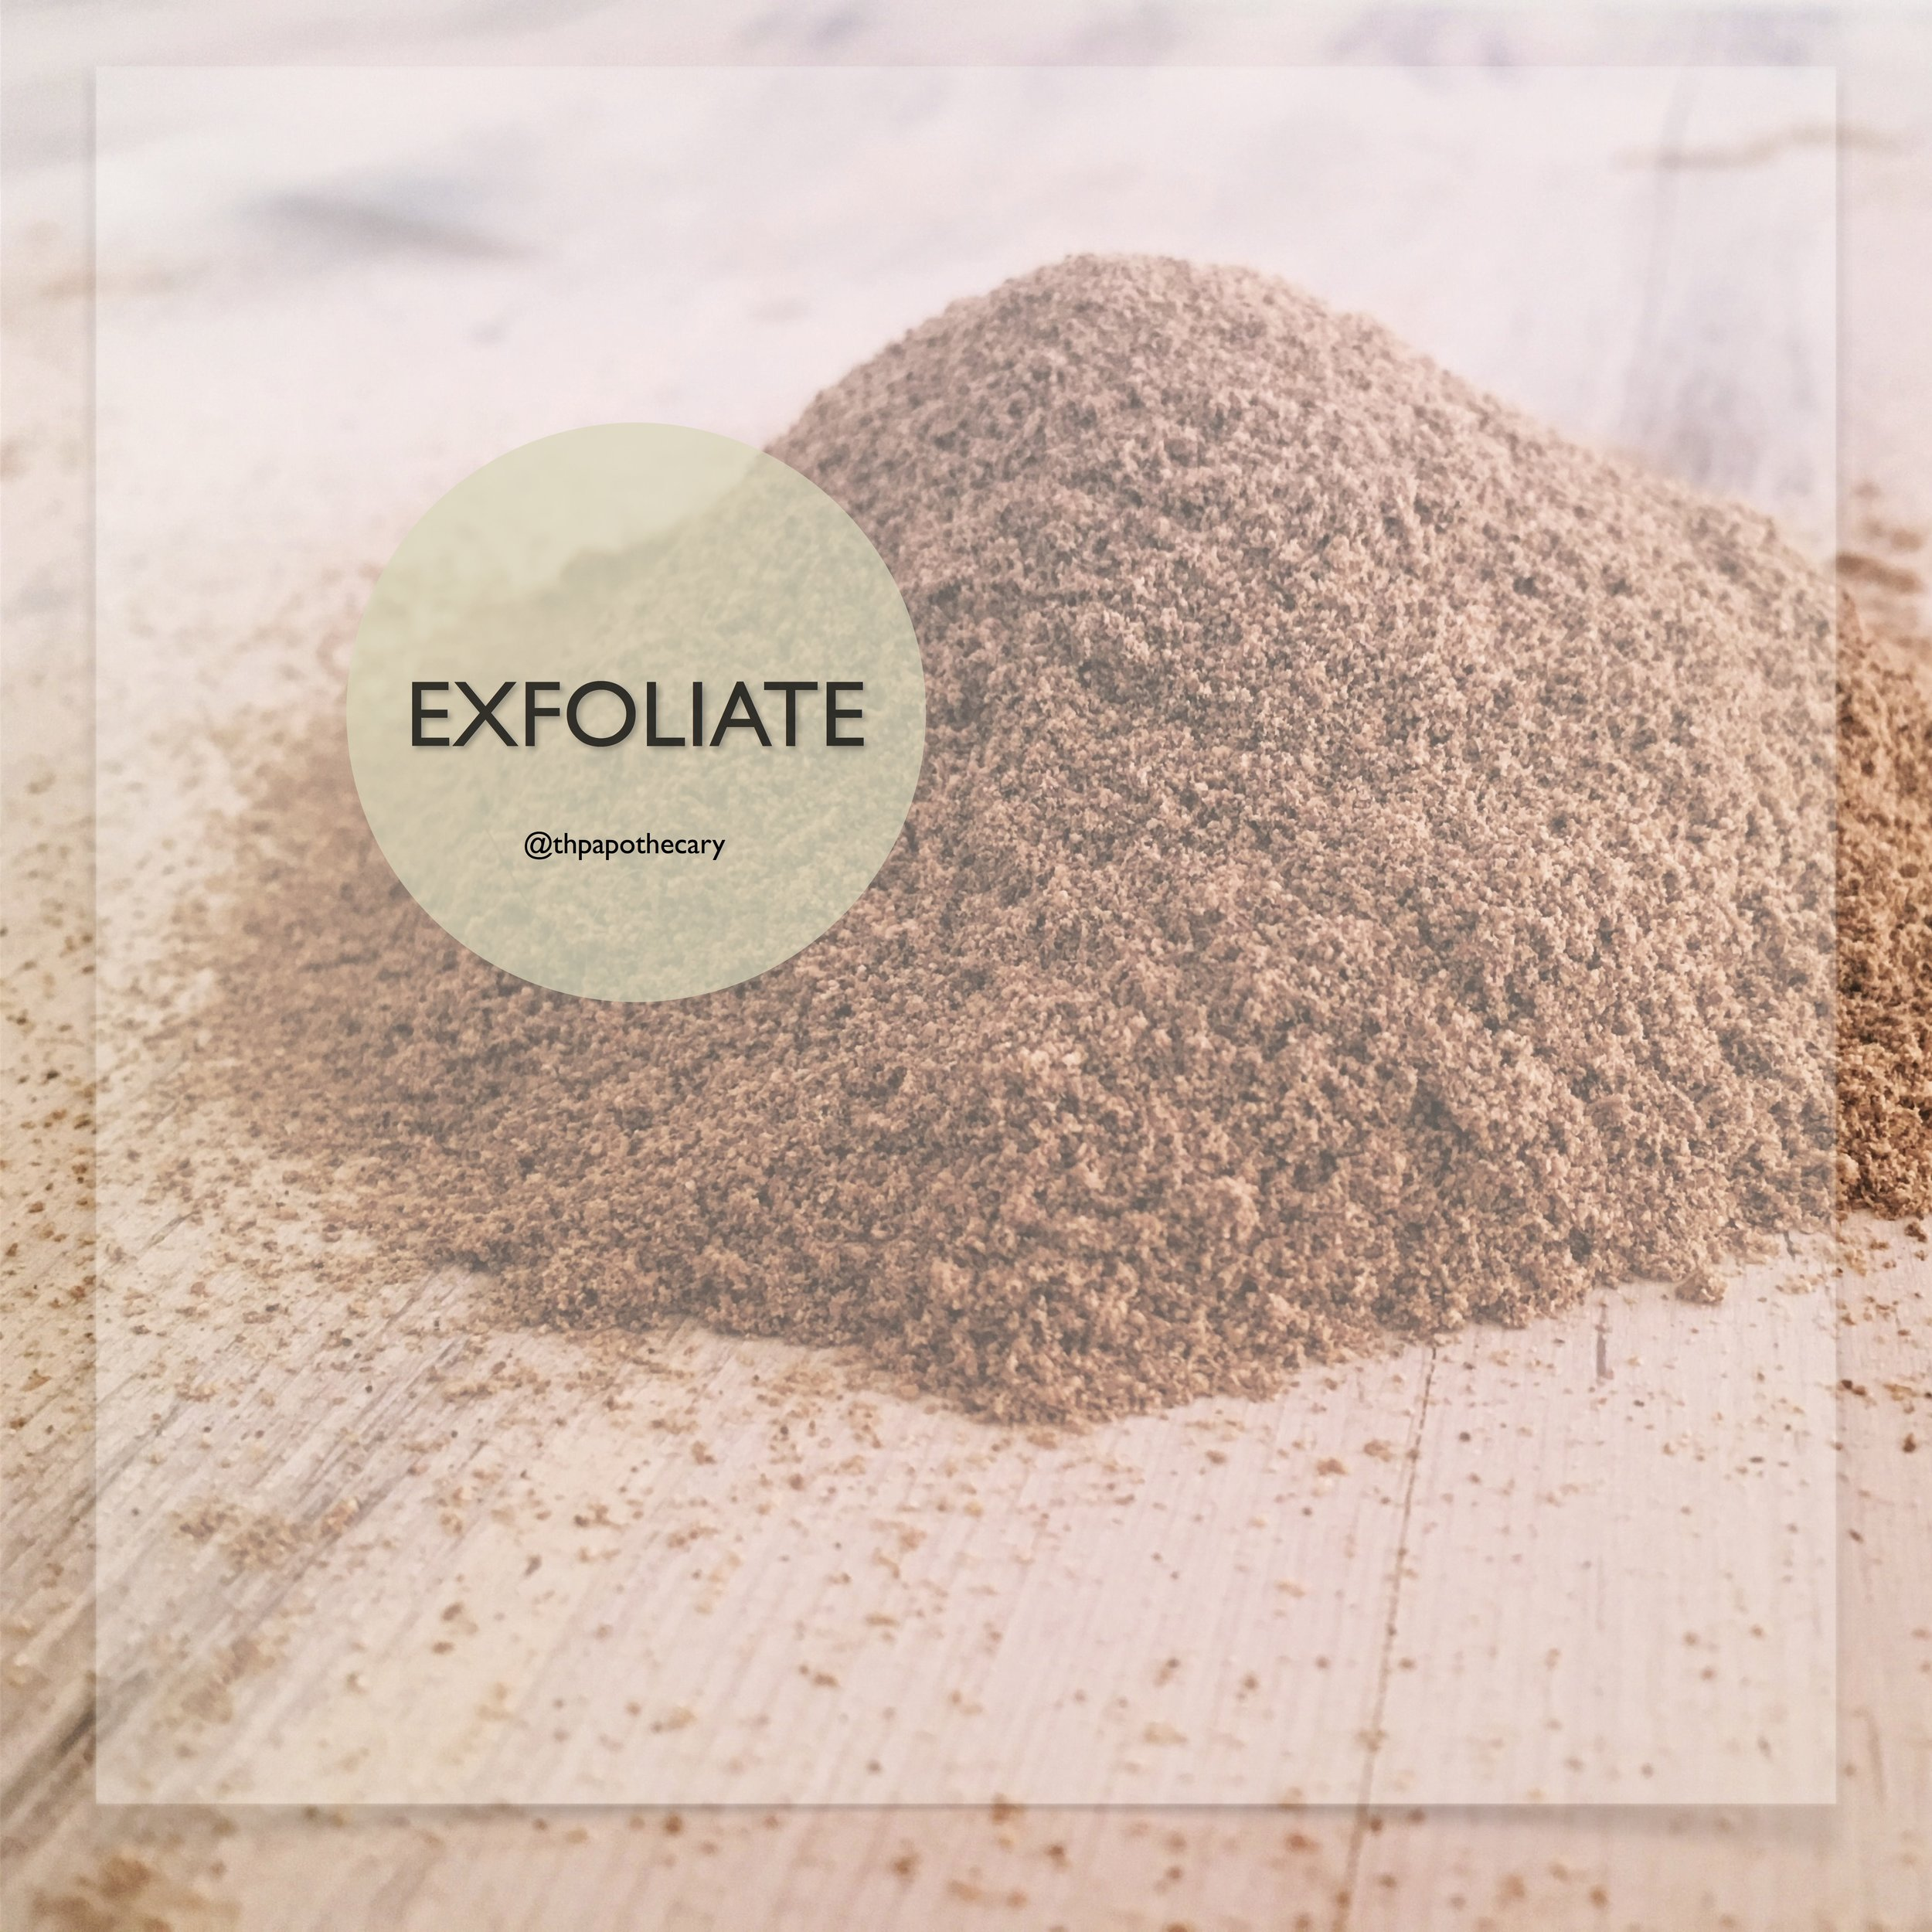 IG_Exfoliate.jpg